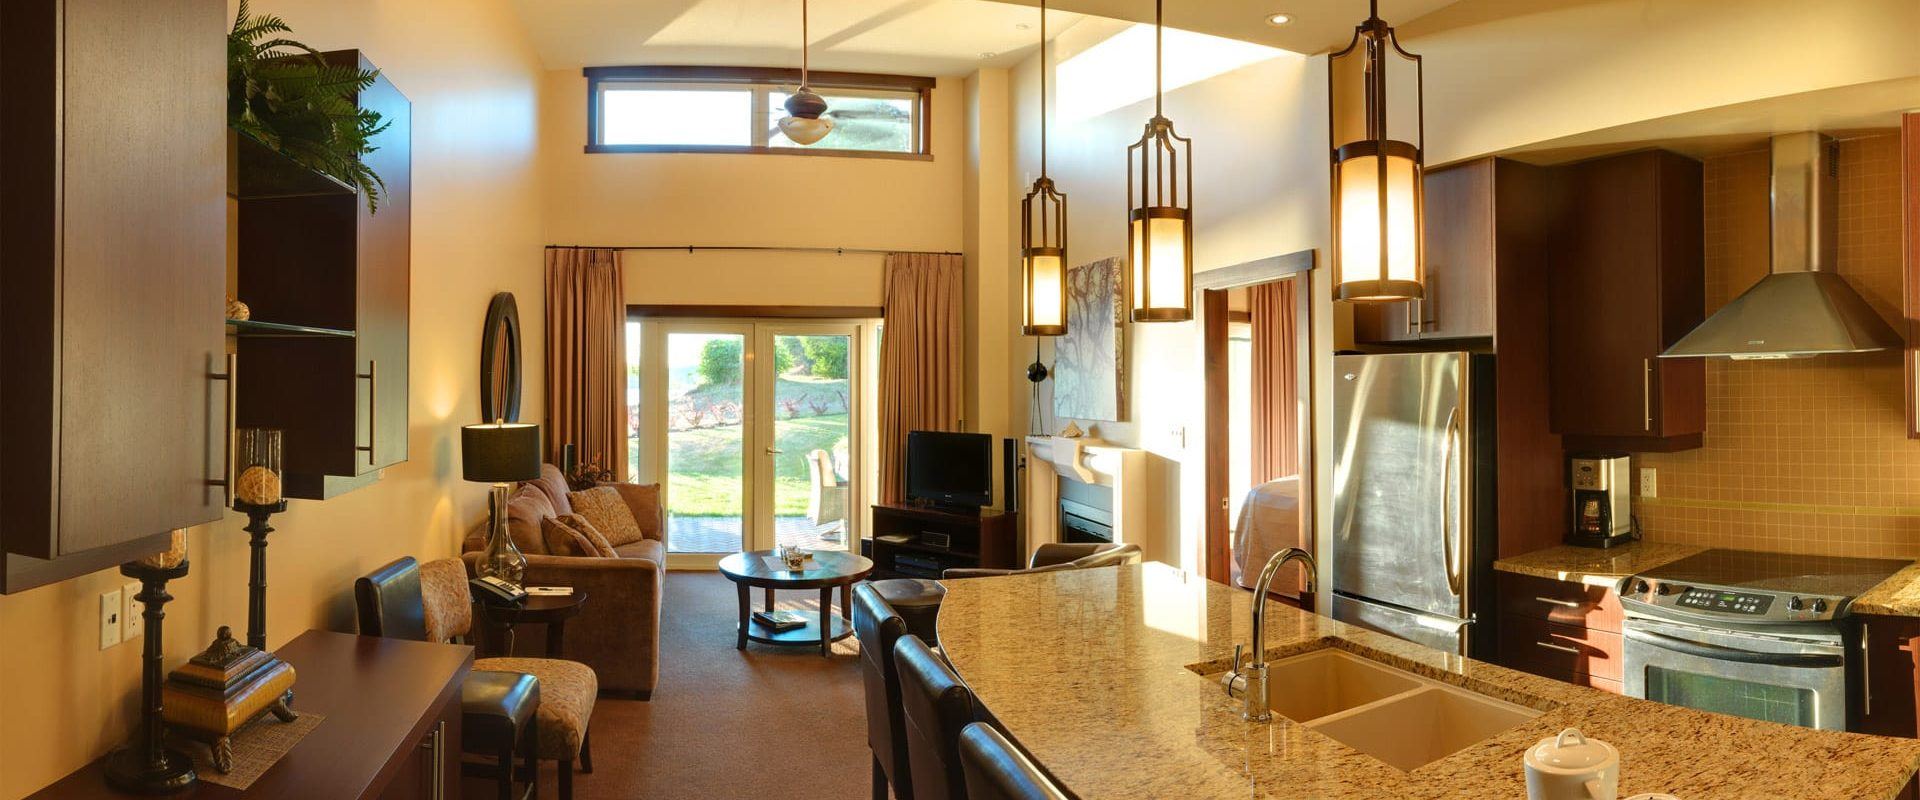 2-bedroom-waterfront-villa-img